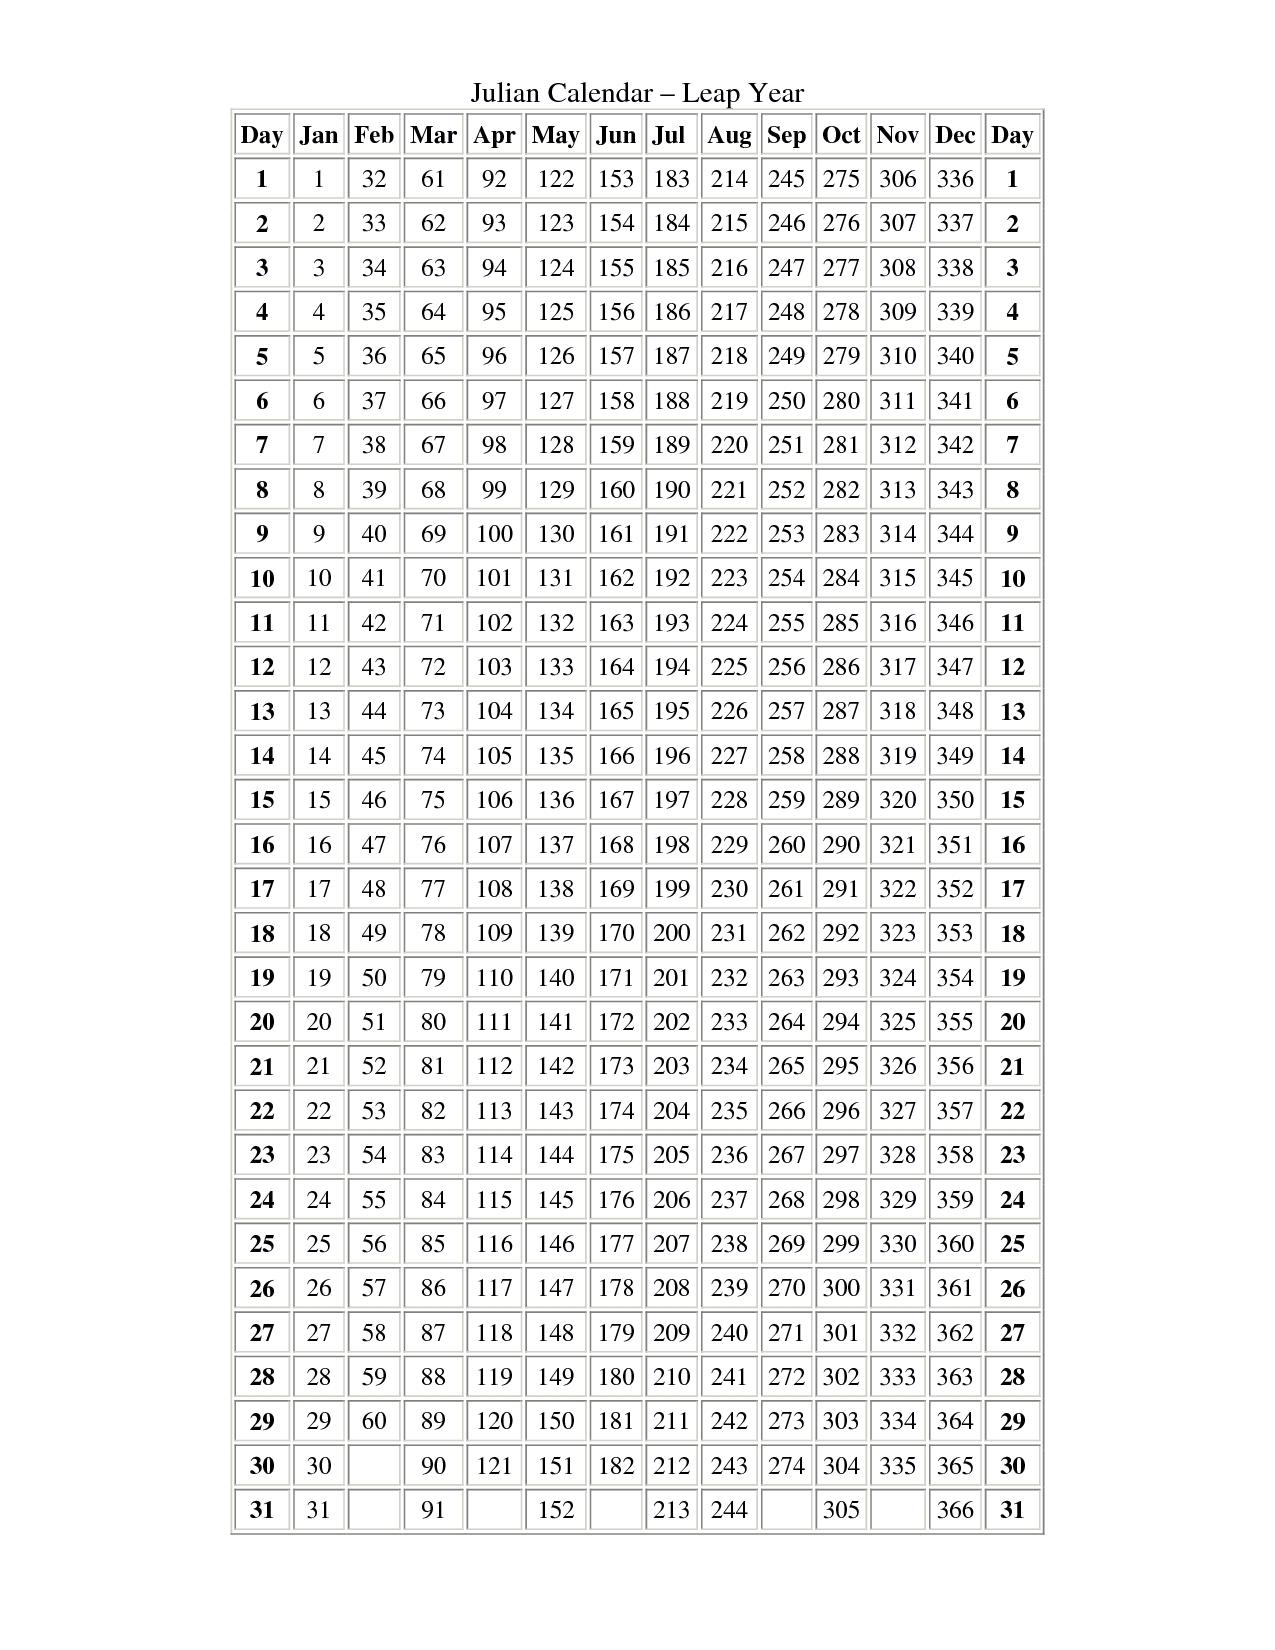 Julian Dates In A Leap Year | Printable Calendar Template 2021 intended for Julian Calendar Perpetual 2021